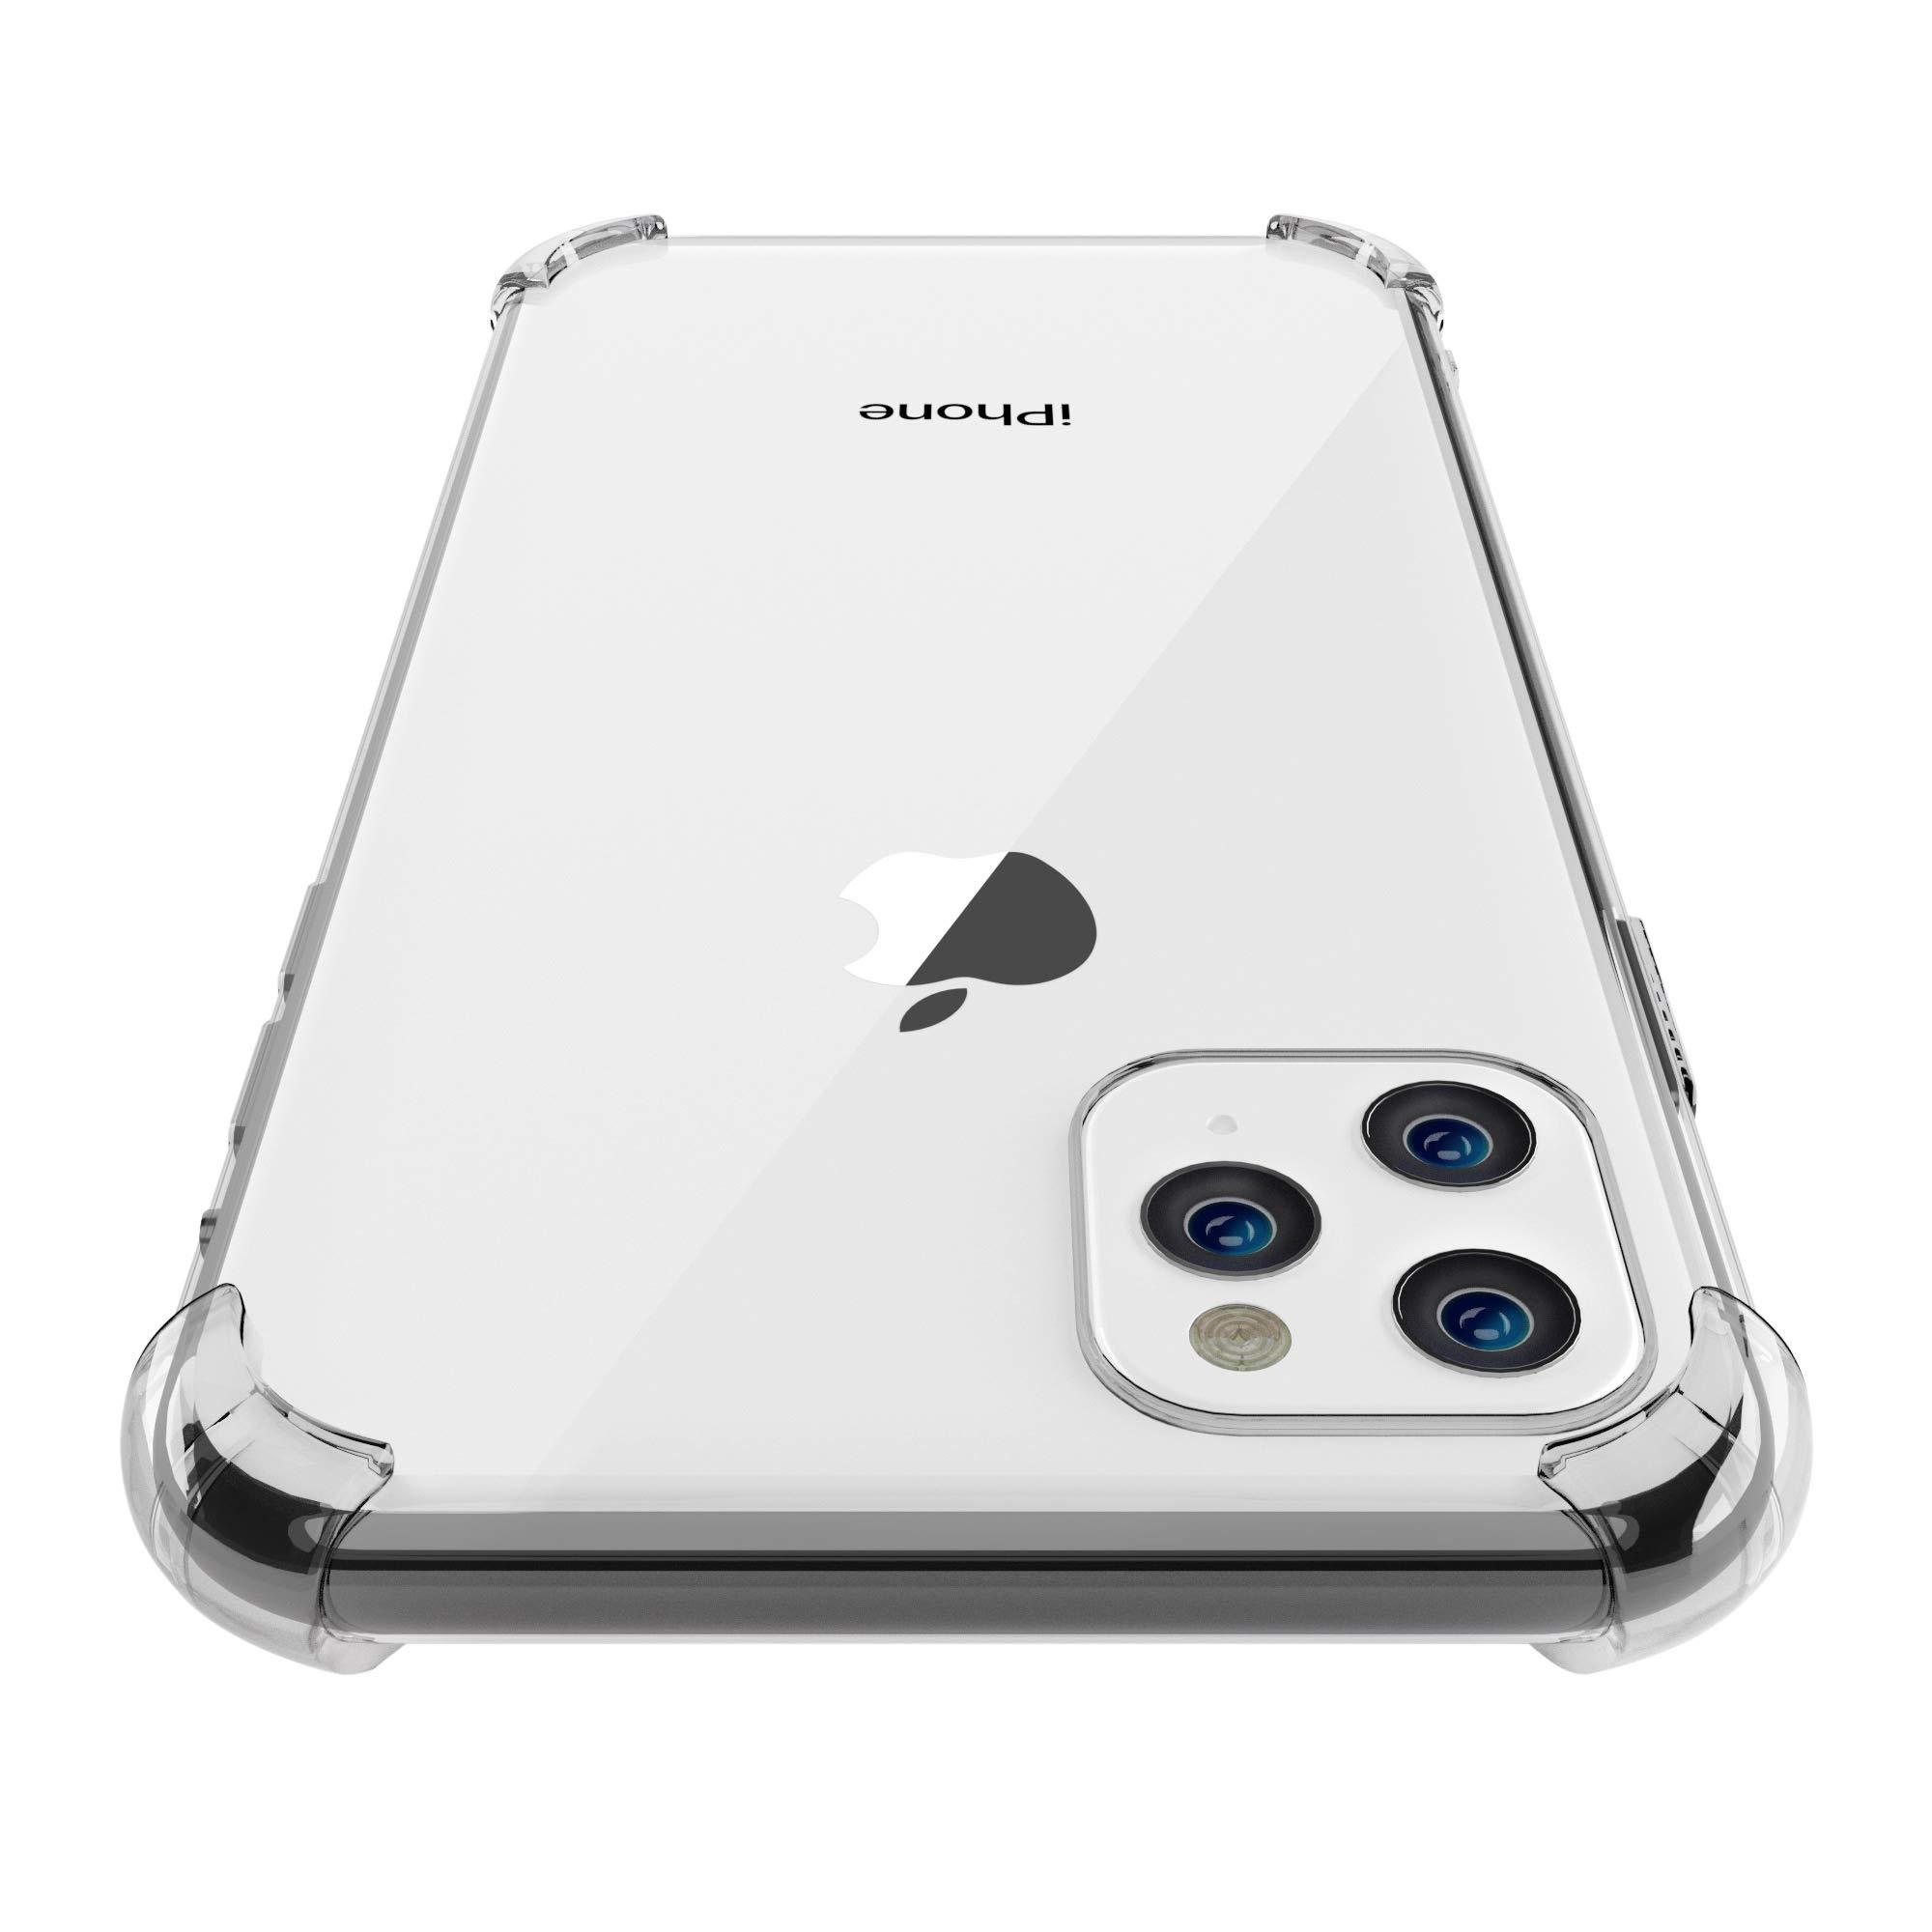 Funda + Vidrio iPhone 11 Pro Max Owm [7wjwd3r7]